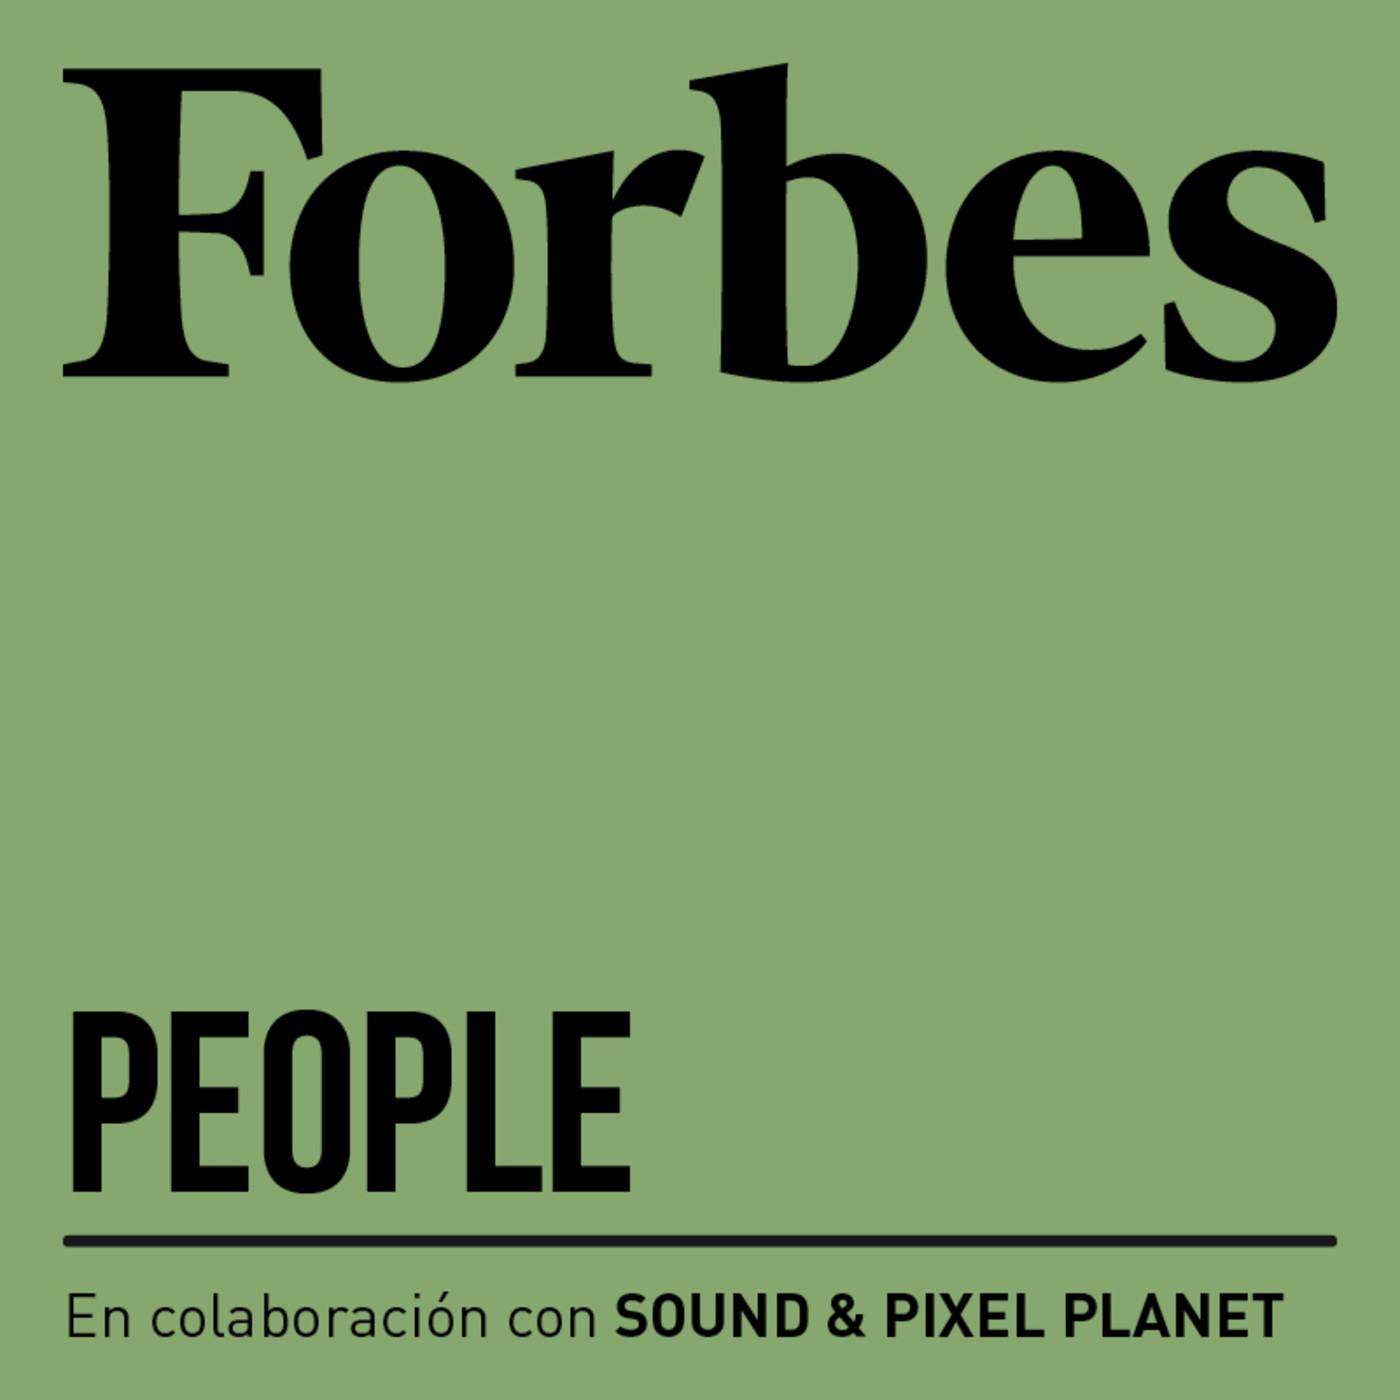 Logo de FORBES PEOPLE